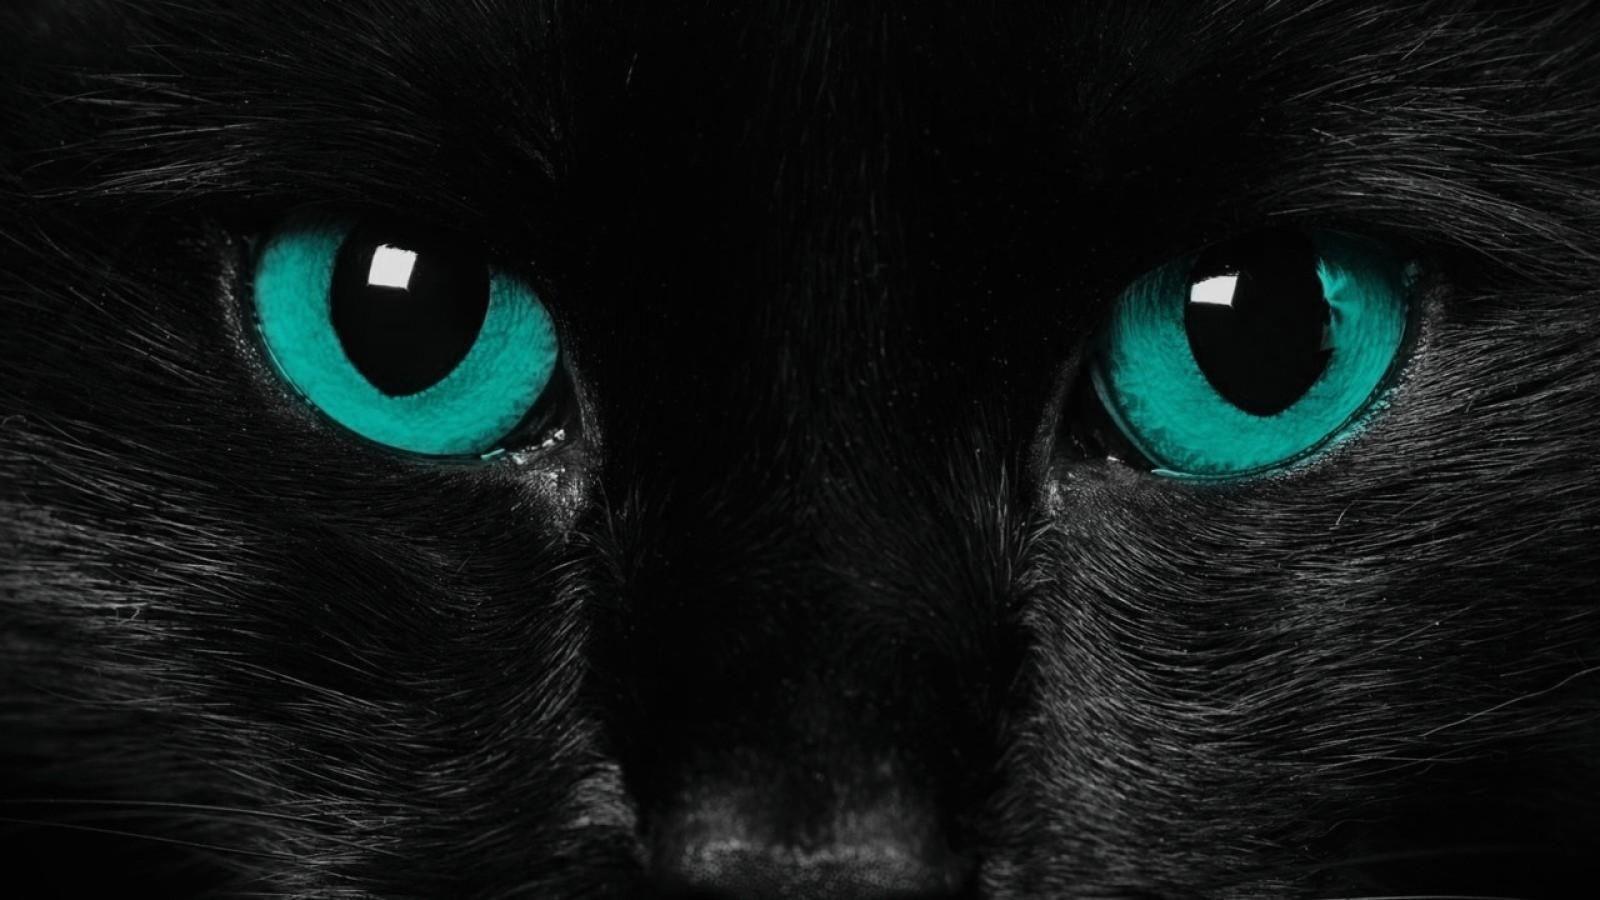 Black Jaguar Wallpapers Wallpaper 1024 768 Black Jaguar Wallpapers 55 Wallpapers Adorable Wallpapers Cat With Blue Eyes Blue Cats Beautiful Cats